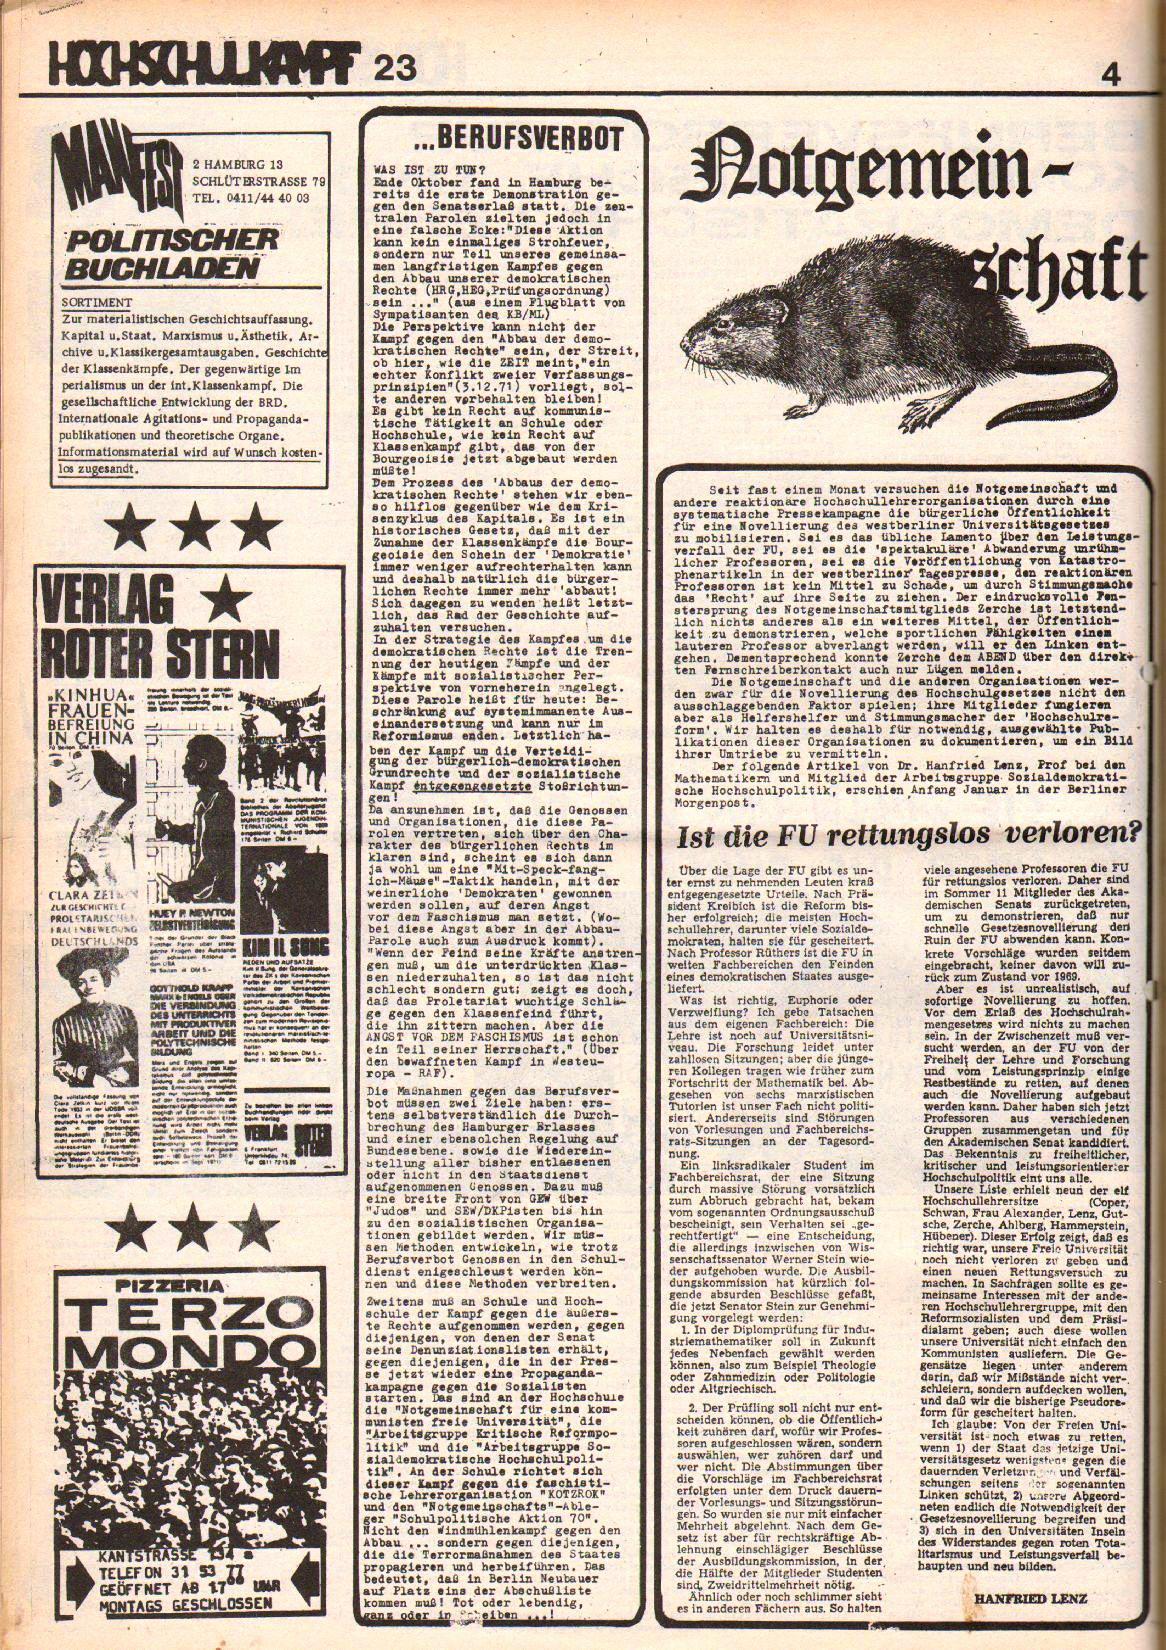 Berlin_Hochschulkampf_1971_23_04